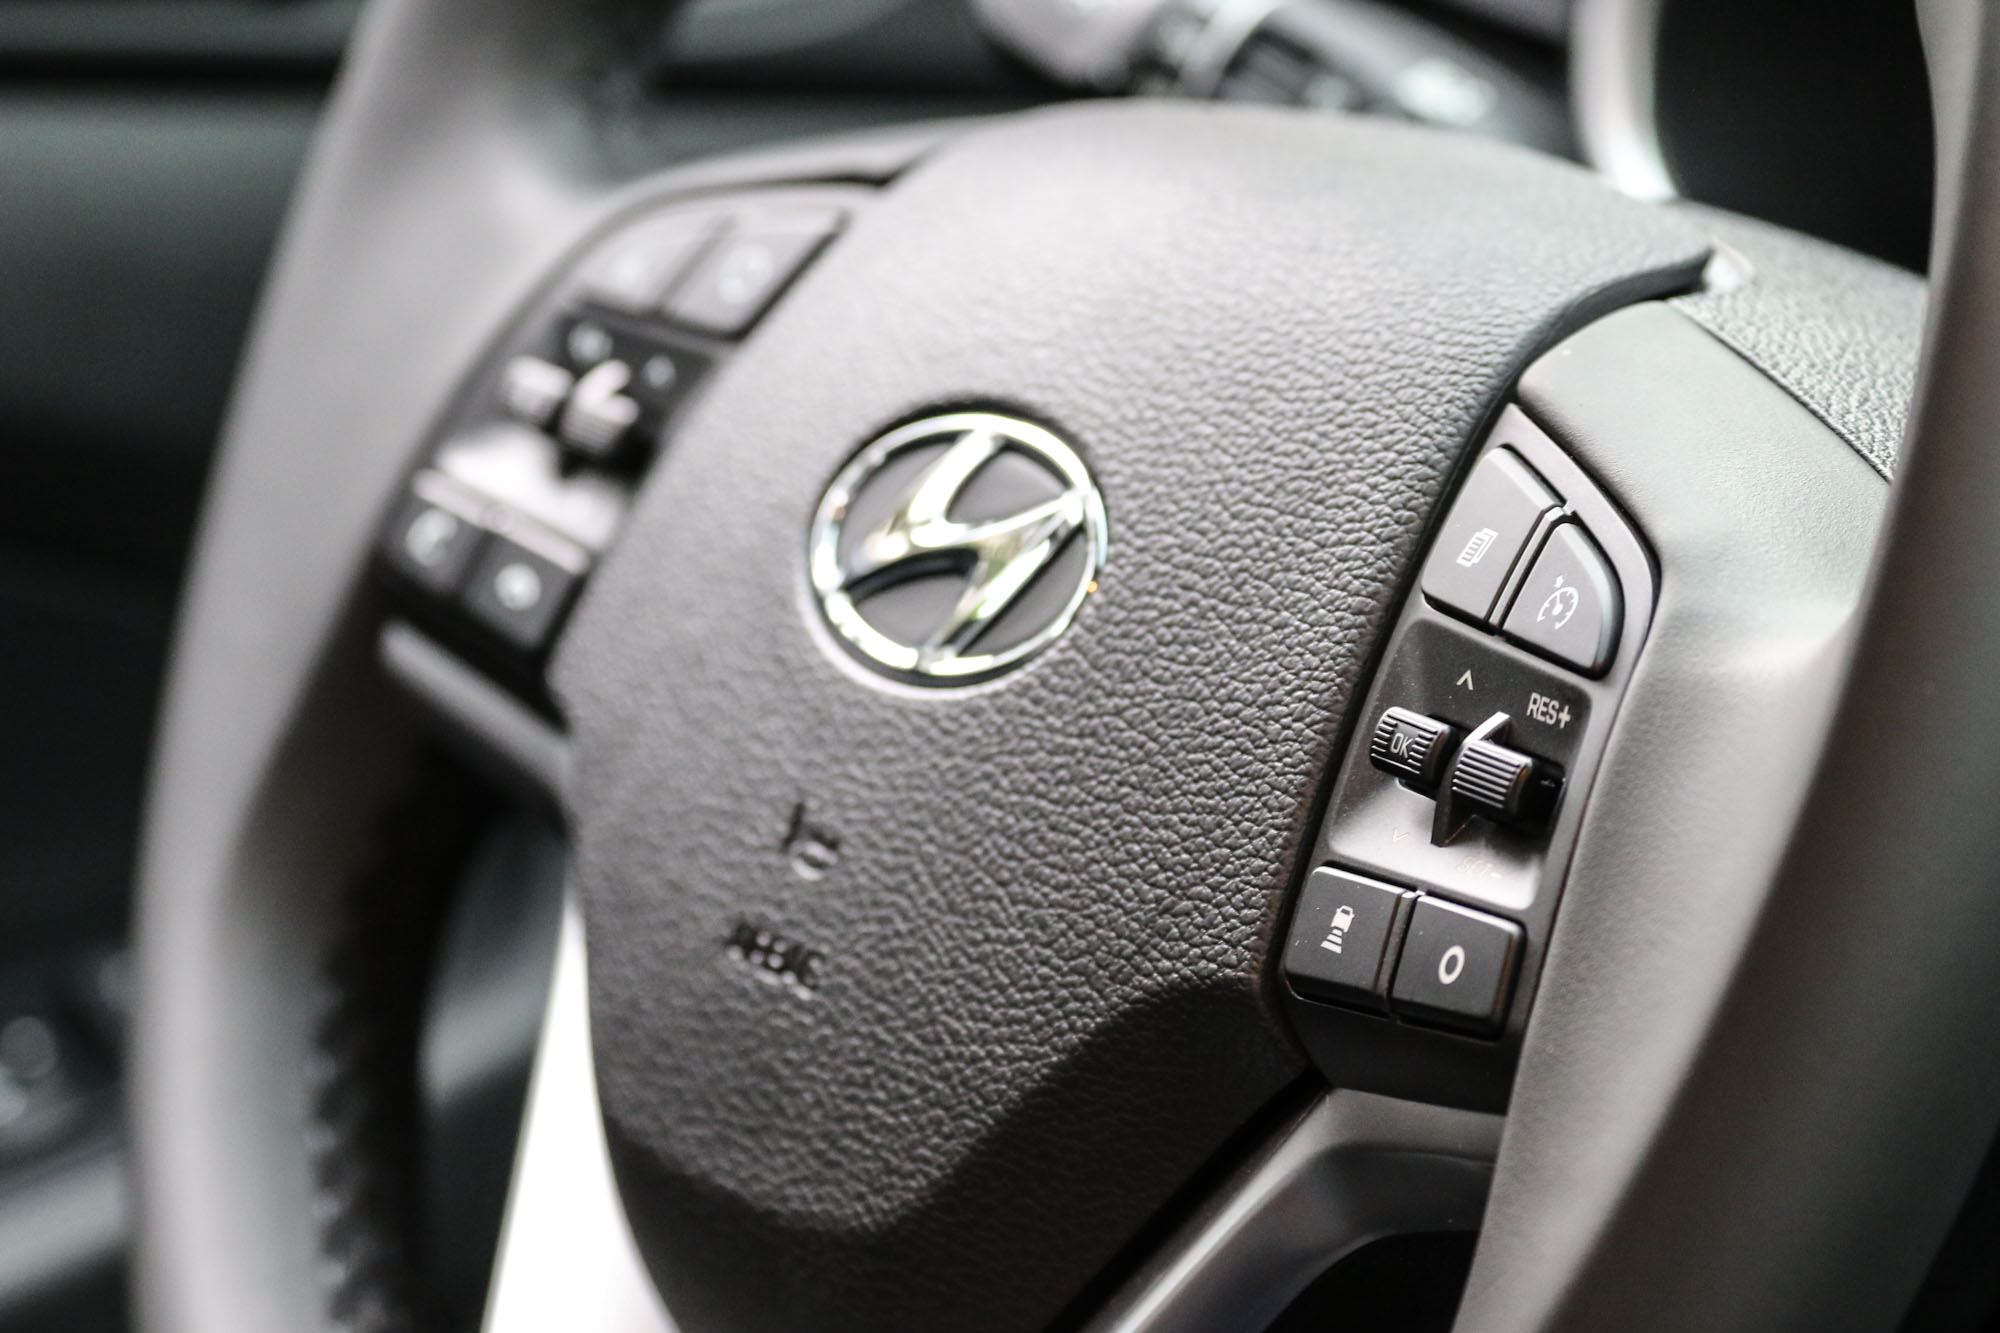 SCC 的智慧型主動車距維持系統可透過方向盤右側的按鍵操作,使用上相當簡單直覺。